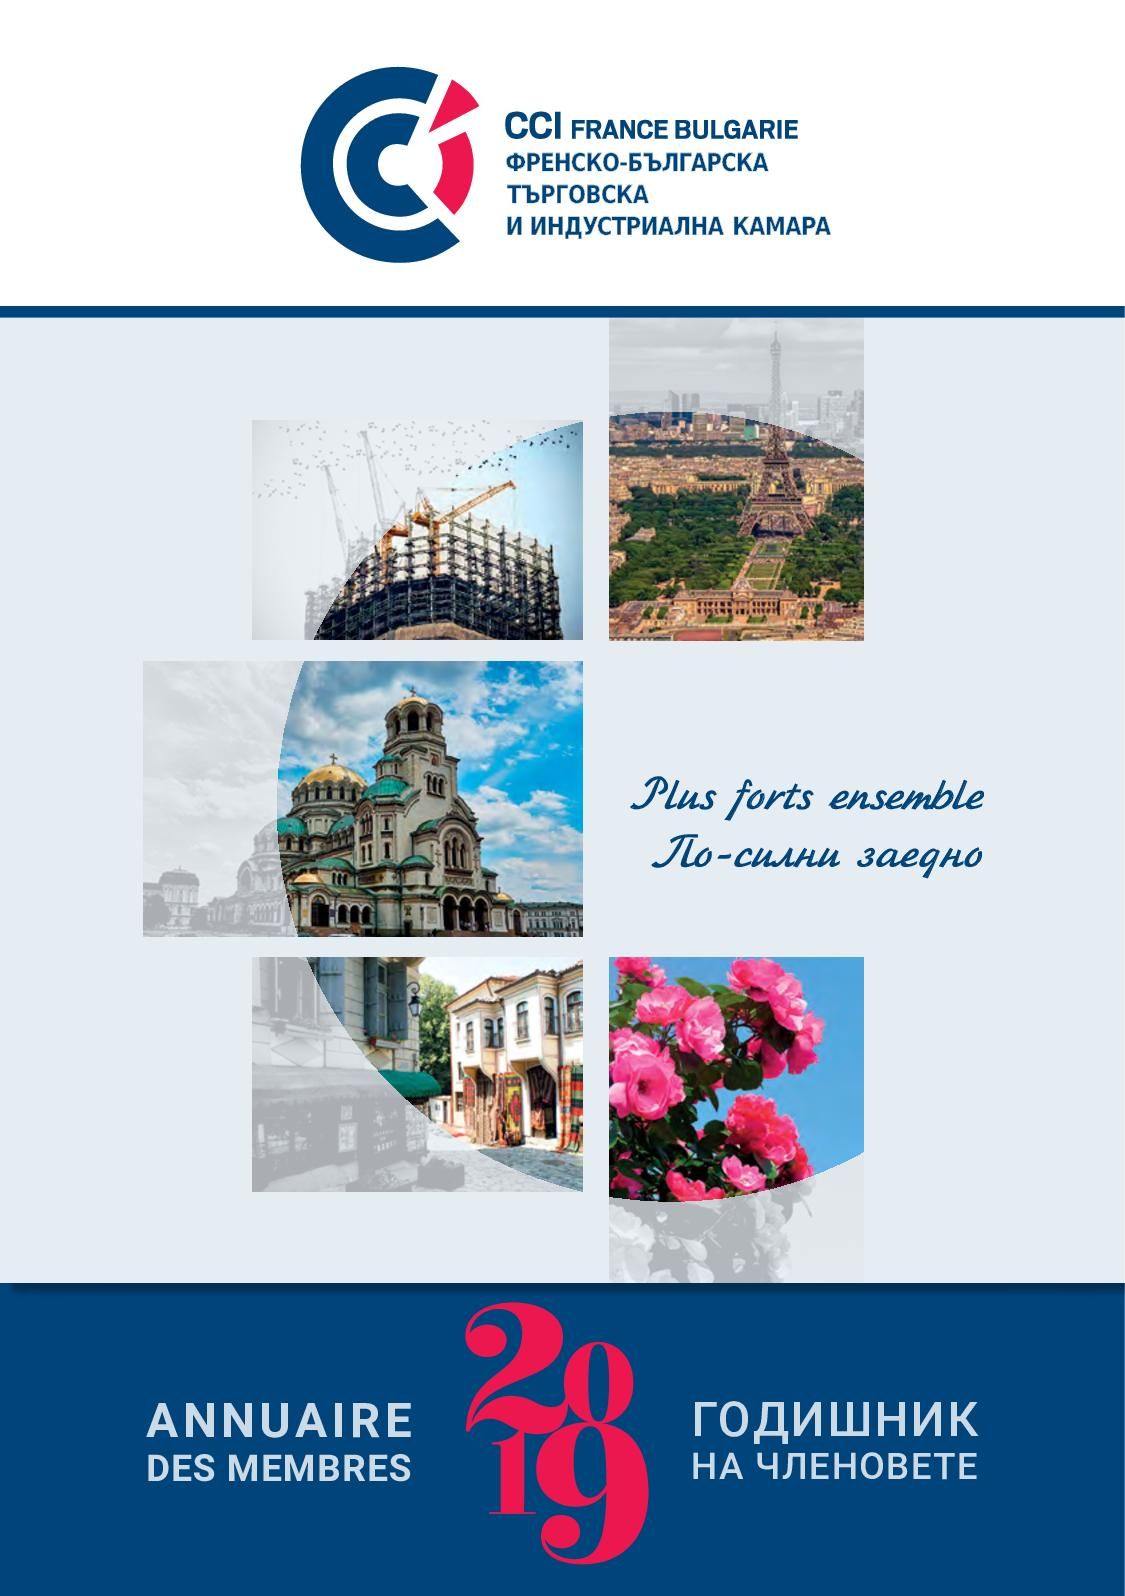 Calameo Annuaire 2019 Cci France Bulgarie